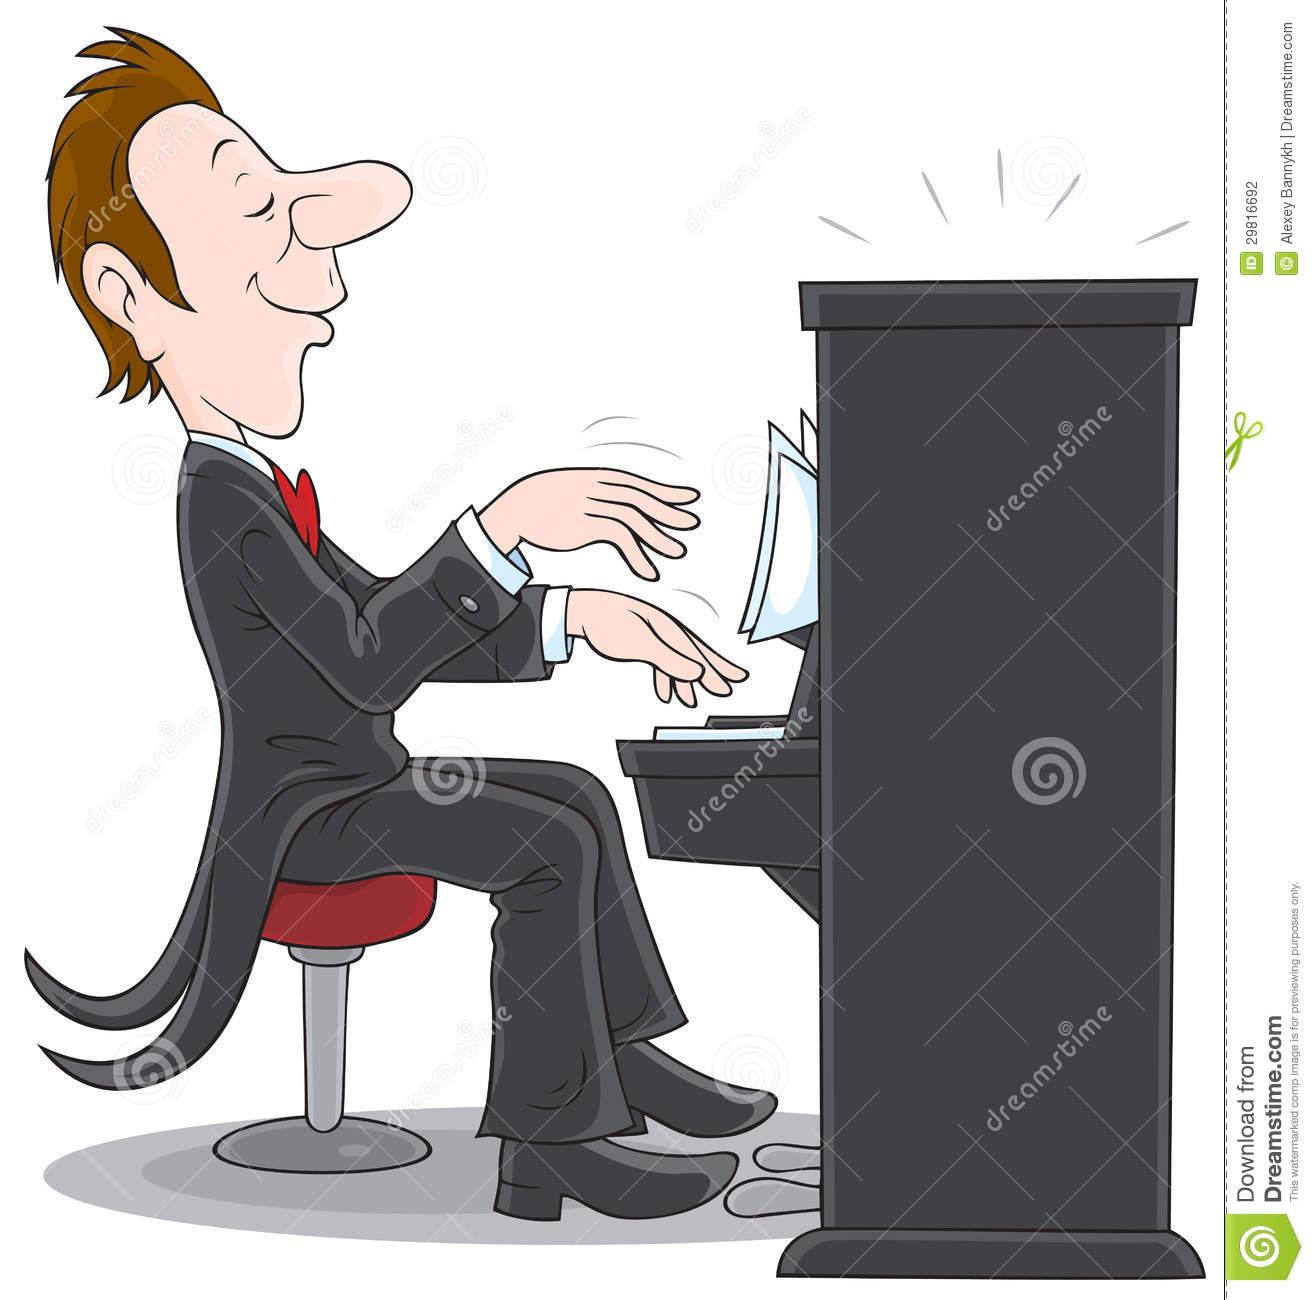 ... musician-plays-the-piano-vector-clip-art-on-a-white-ninYyU-clipart.jpg